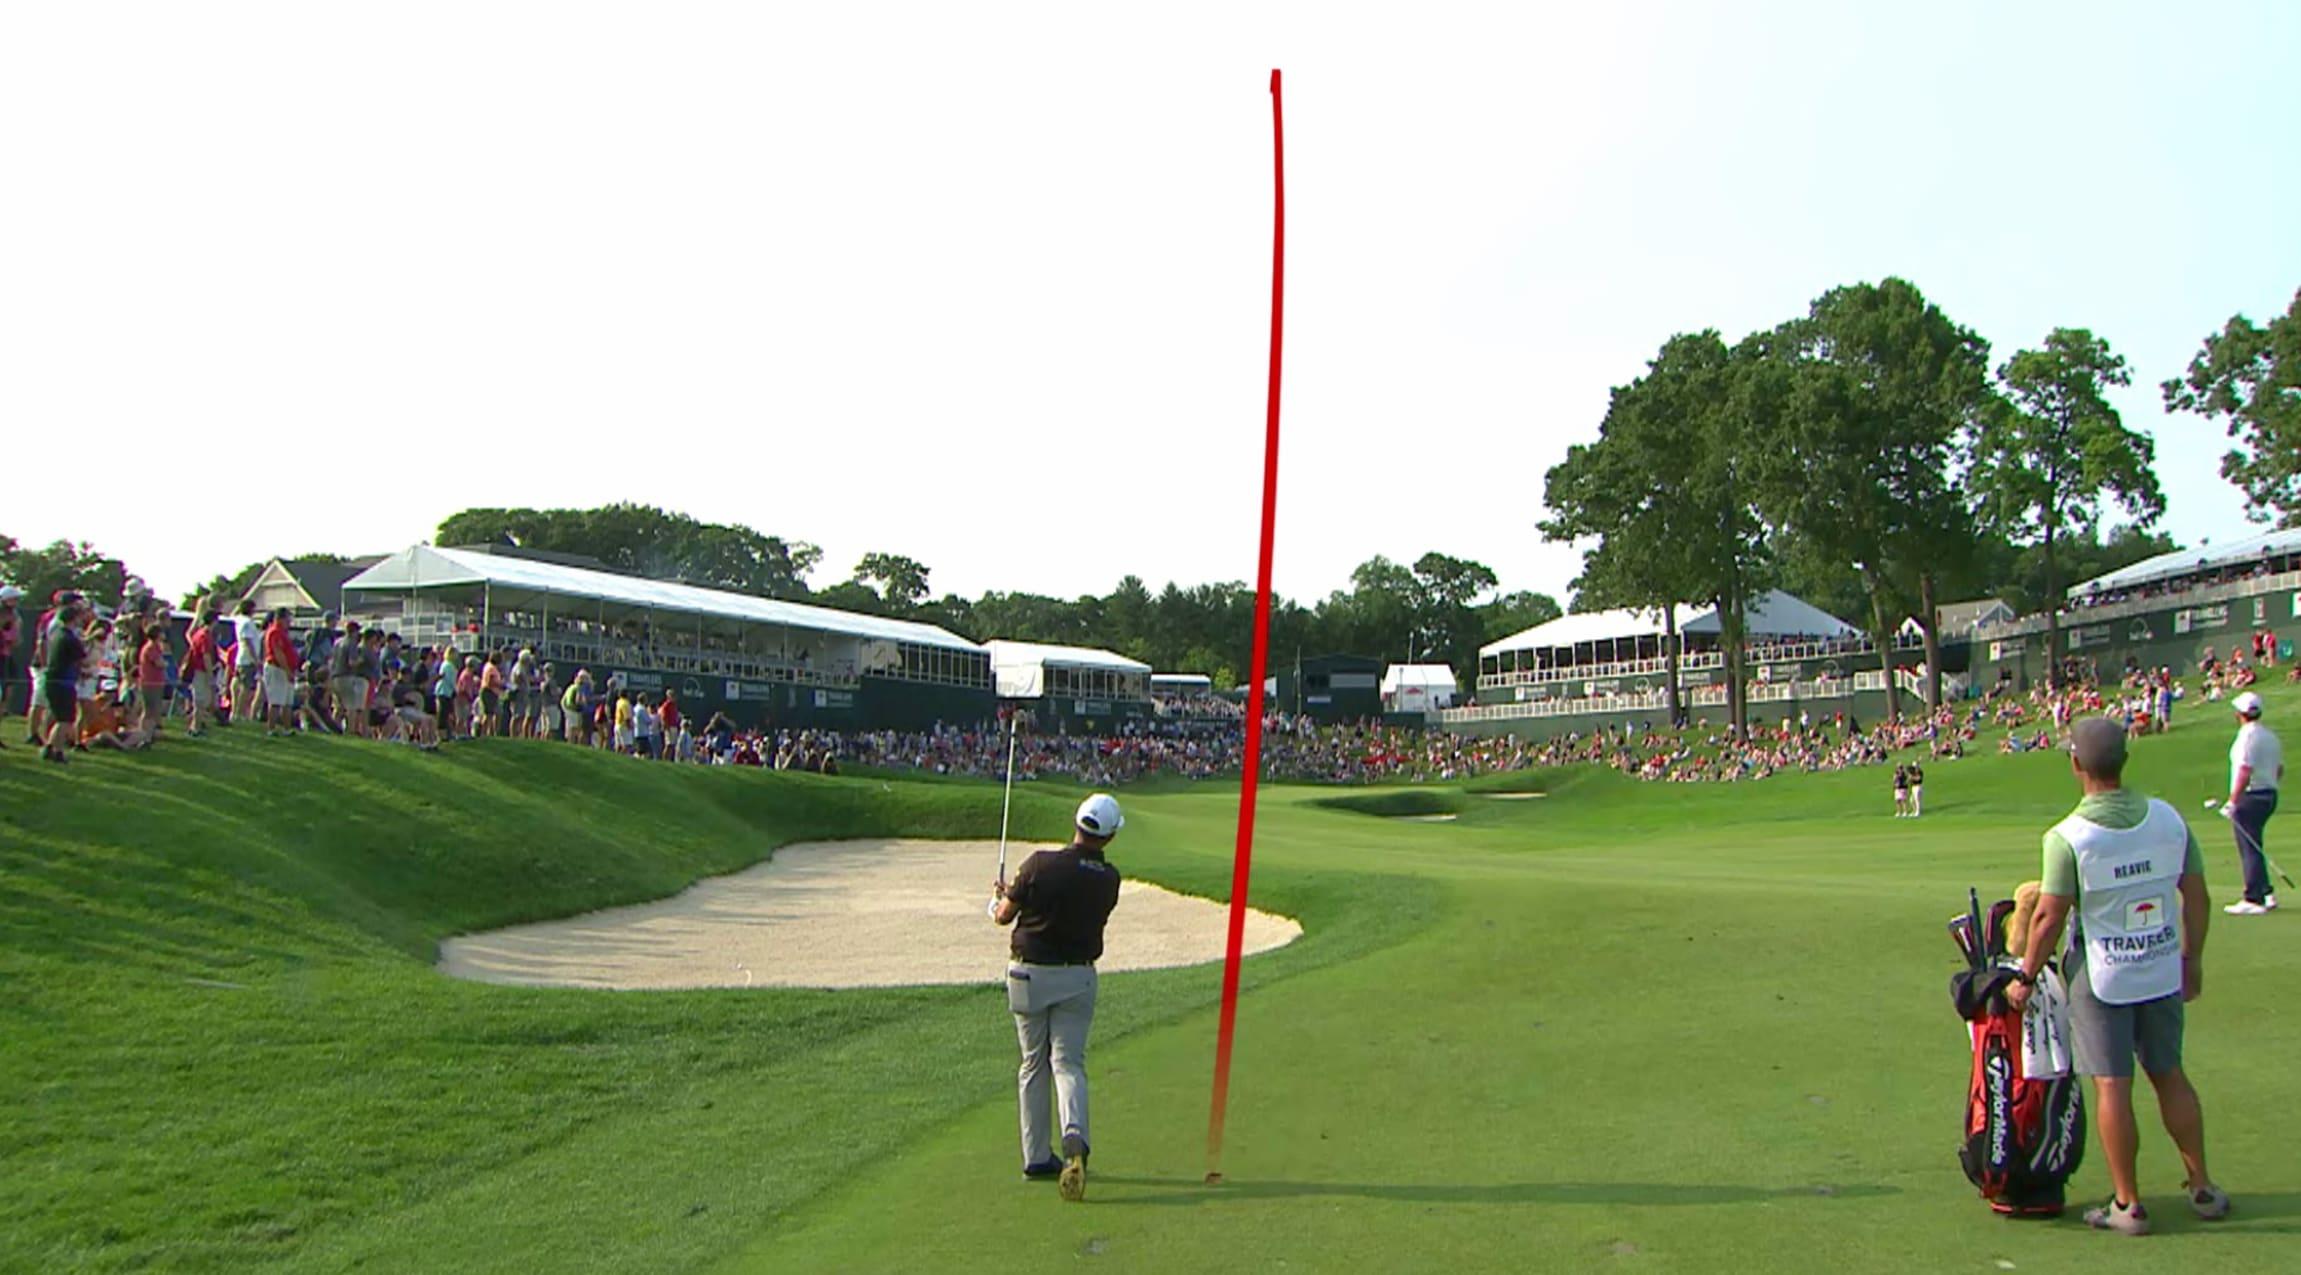 Brooks Koepka PGA TOUR Profile - News, Stats, and Videos